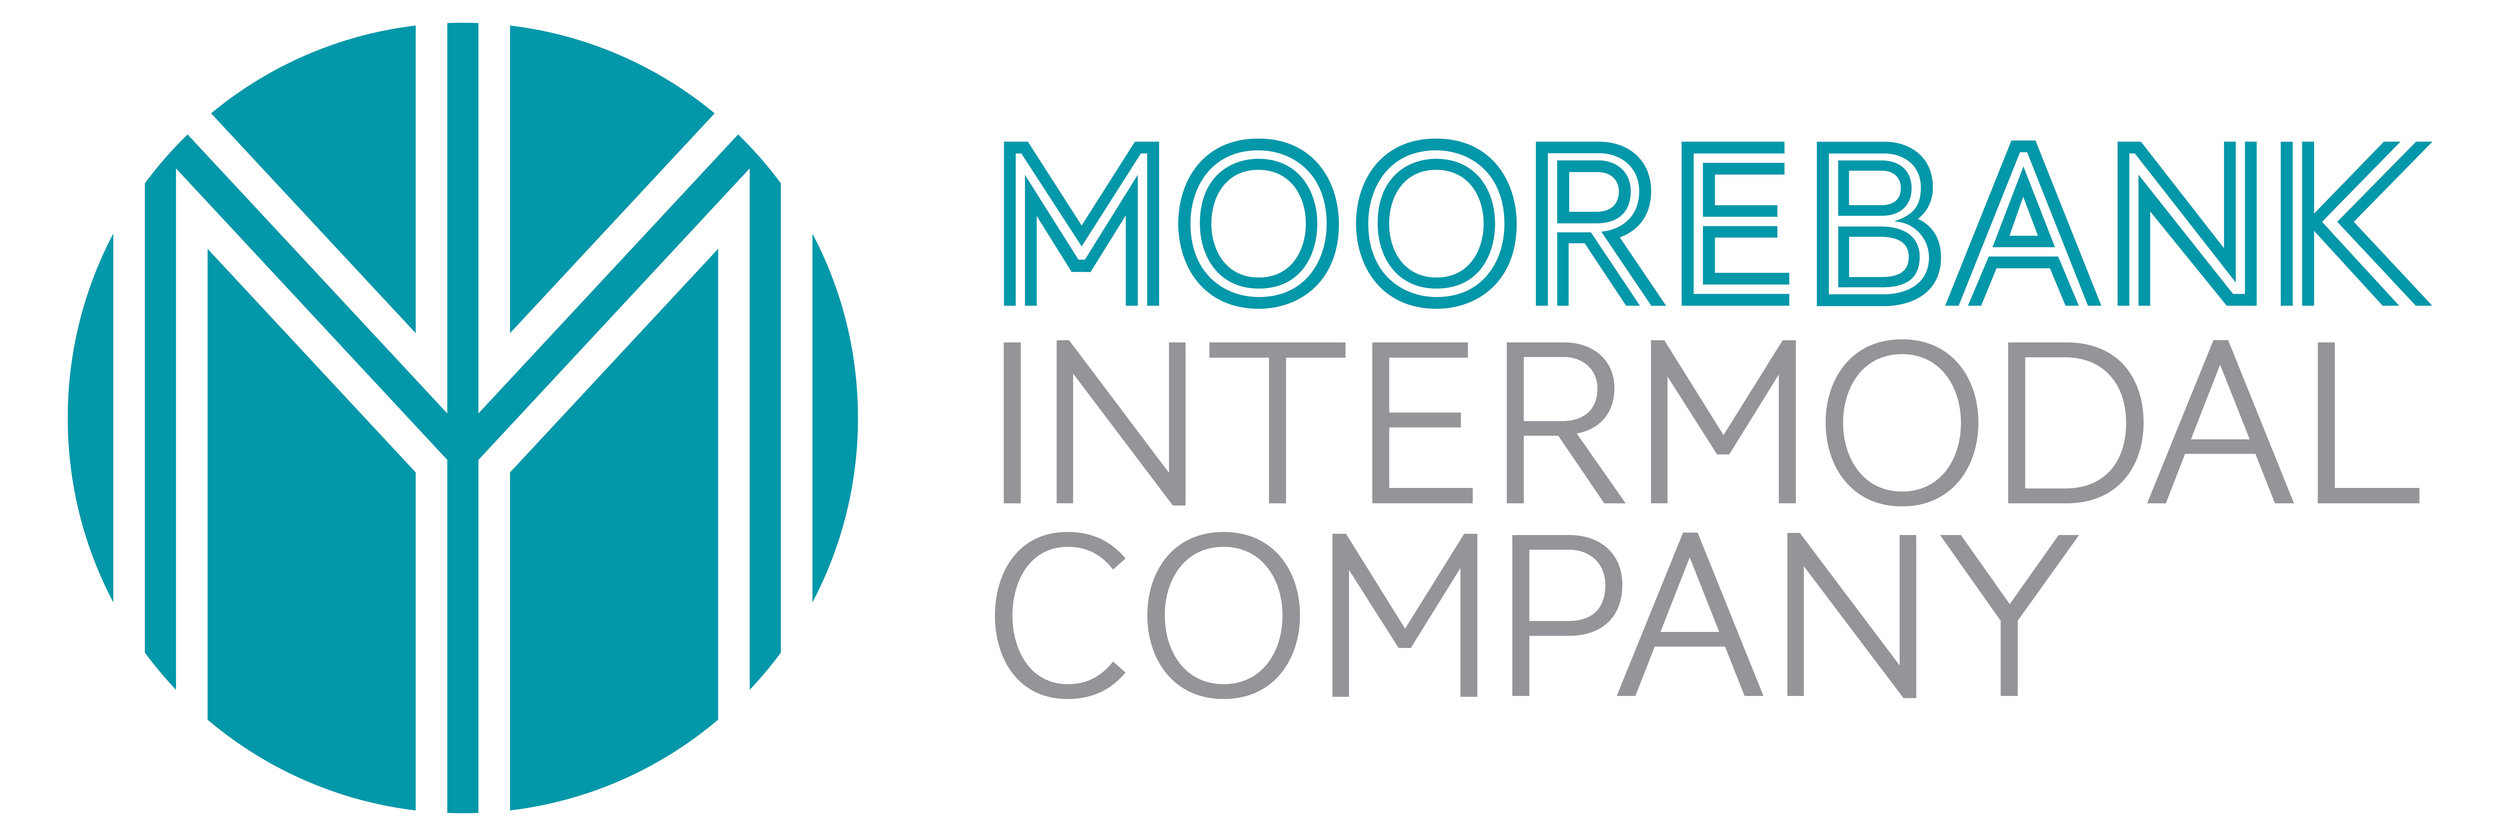 Moorebank Intermodal Corp logo -  MIC_BrandmarkEucalyptus_RGB.jpg